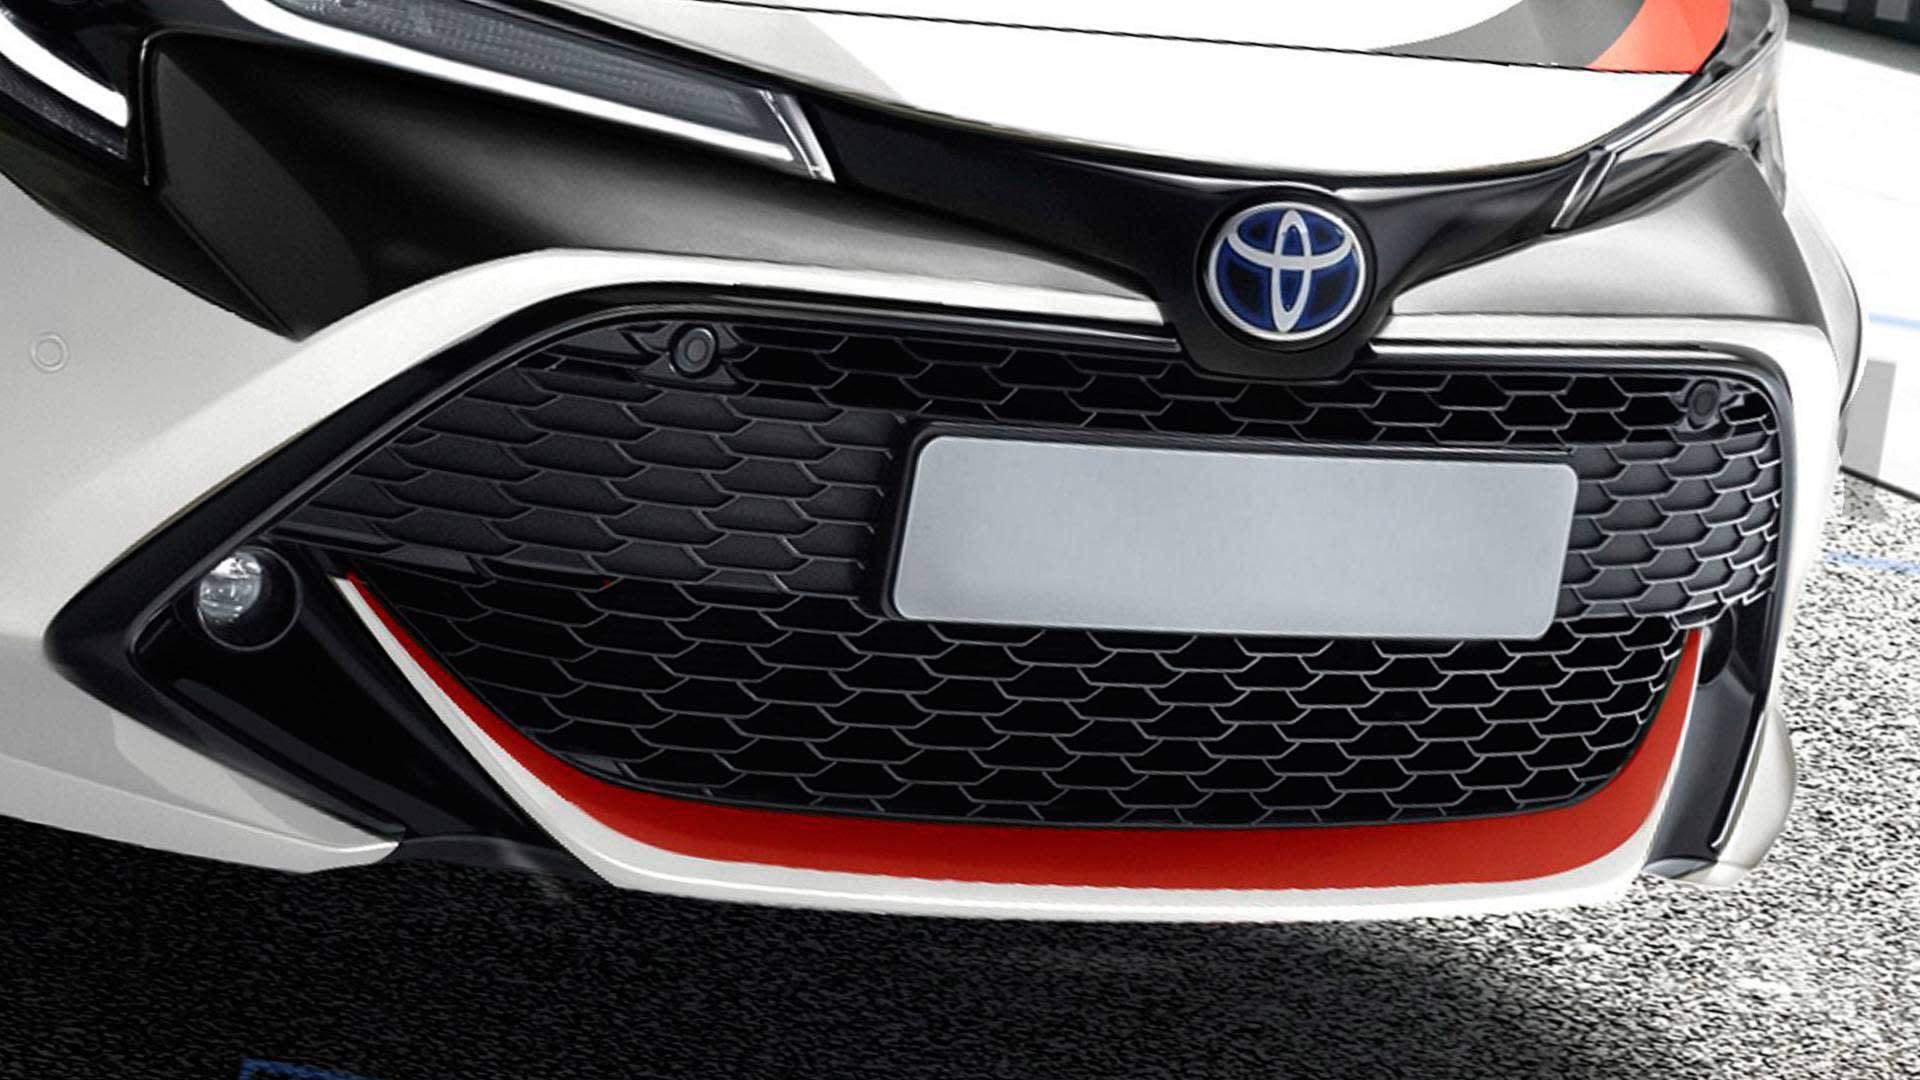 Toyota Corolla hot hatch hybrid under consideration